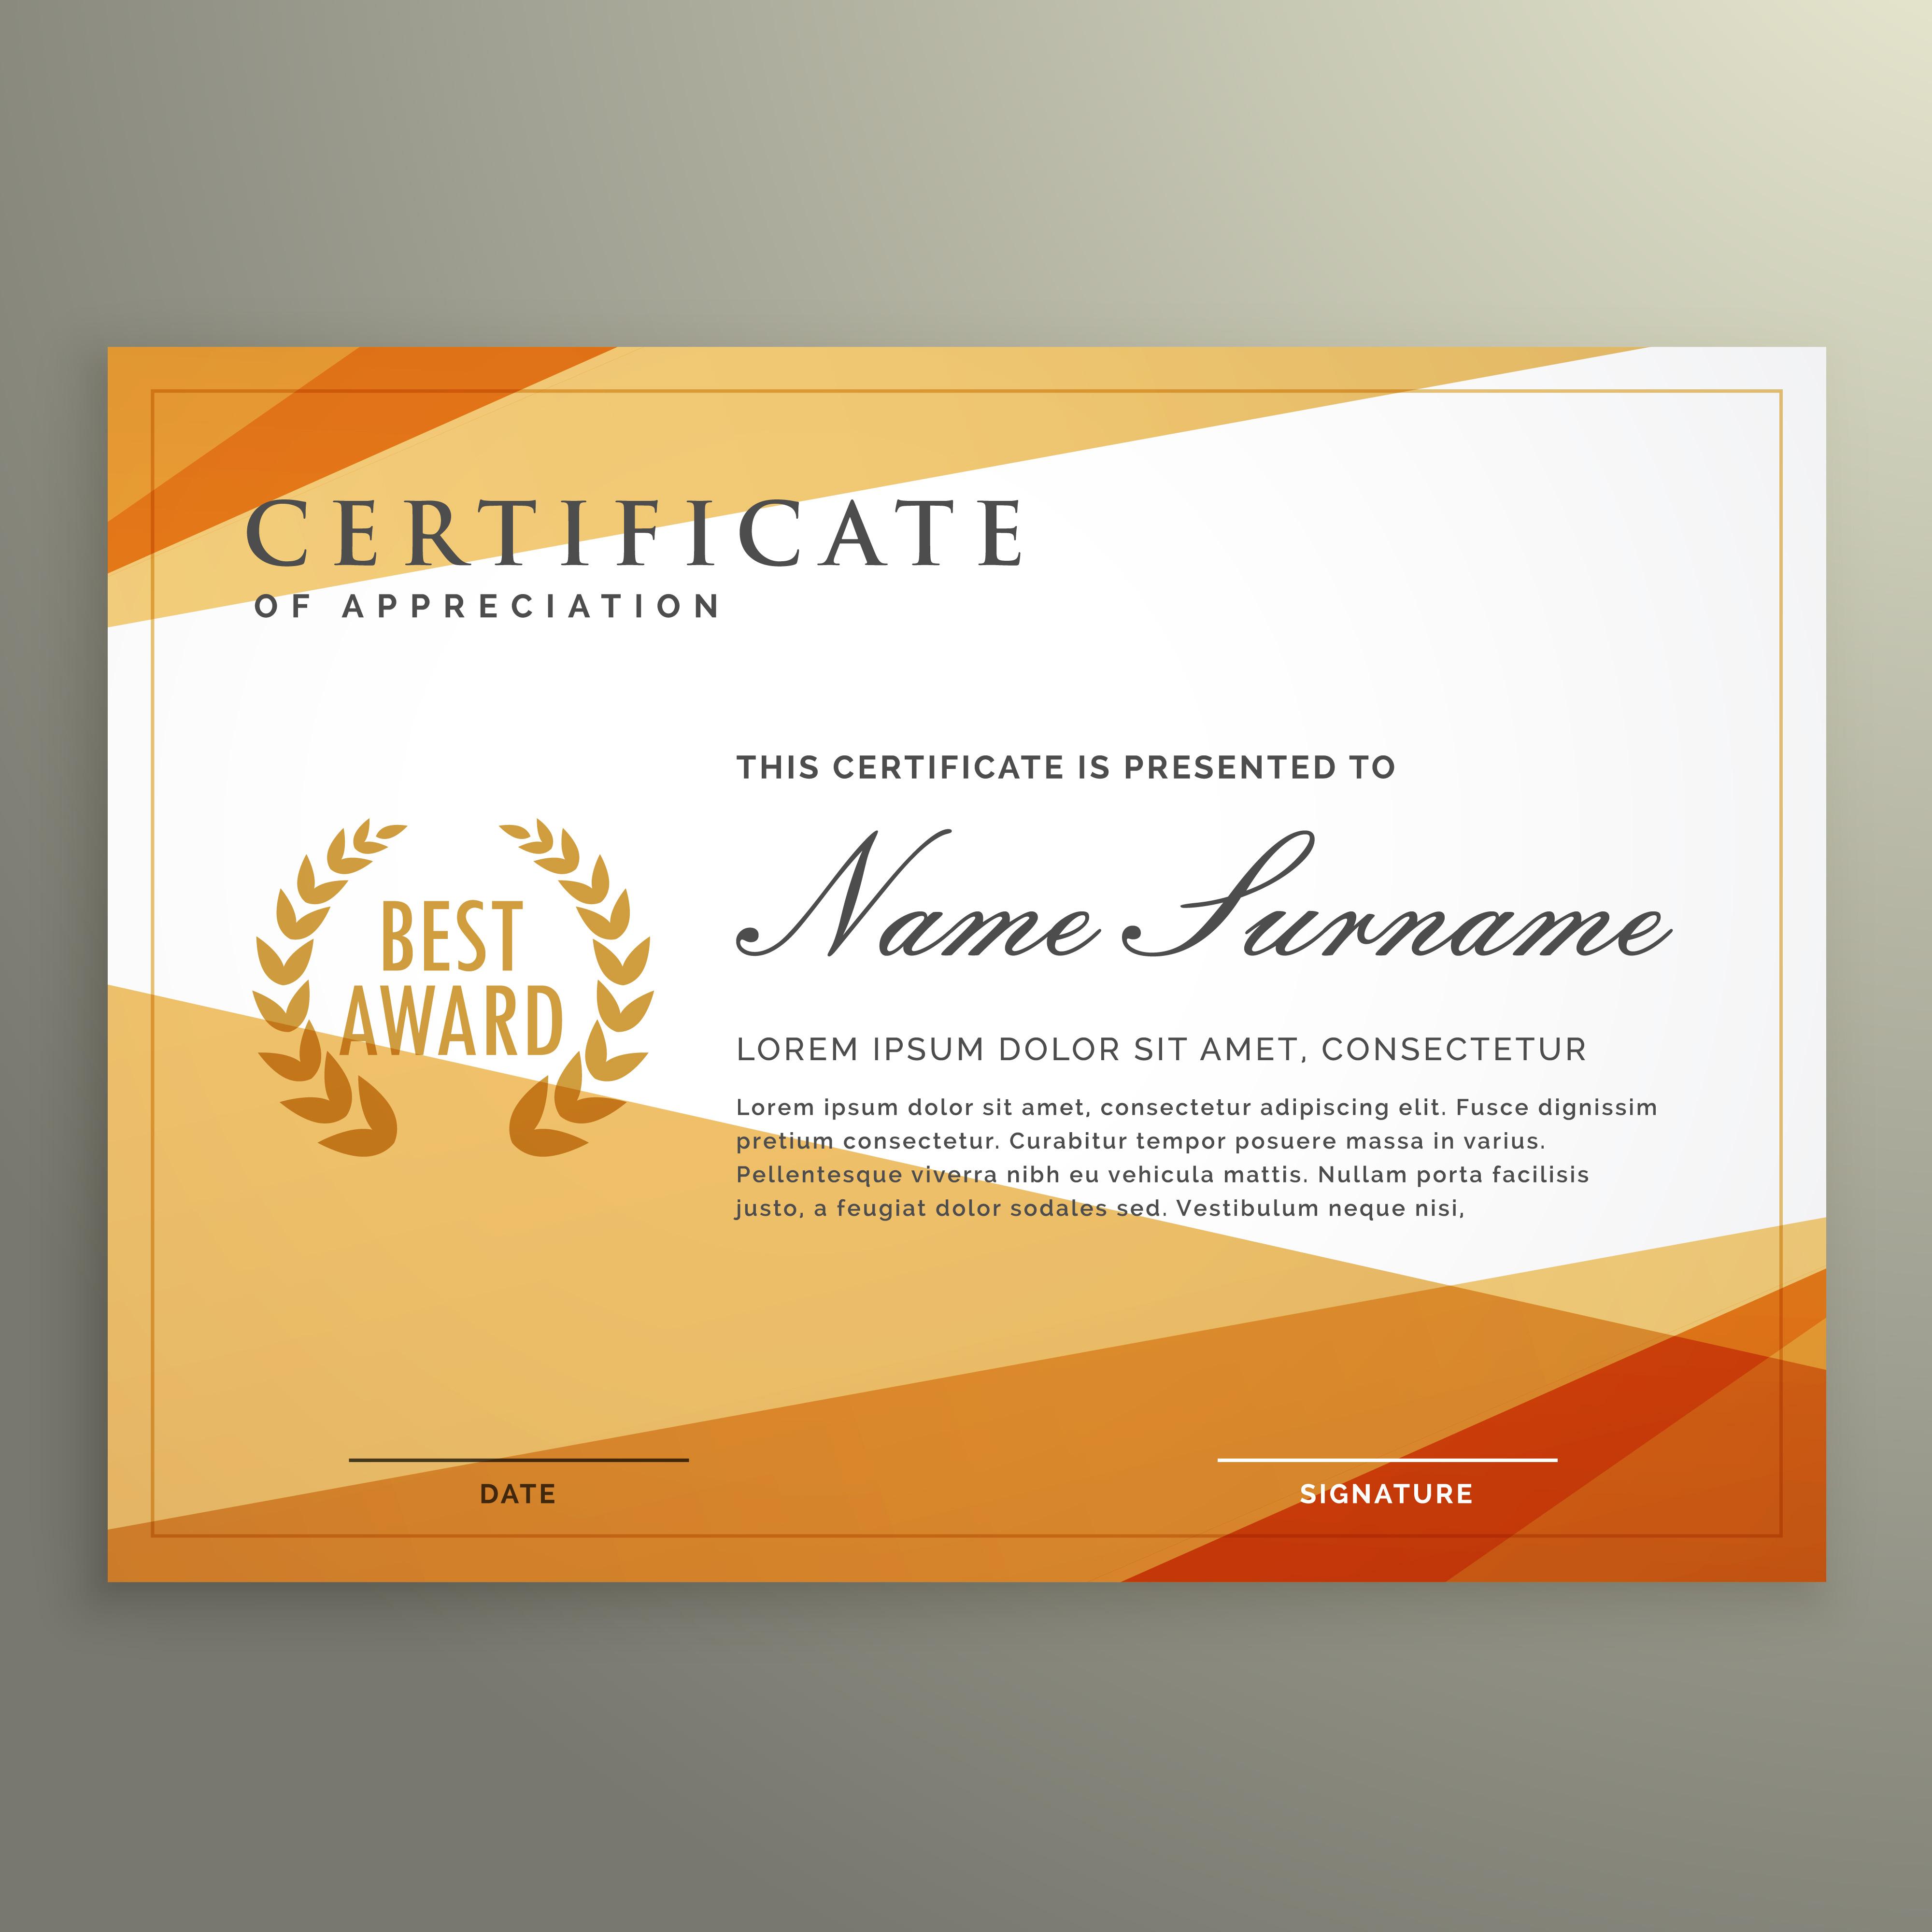 Geometric Certificate Design Template Download Free Vector Art